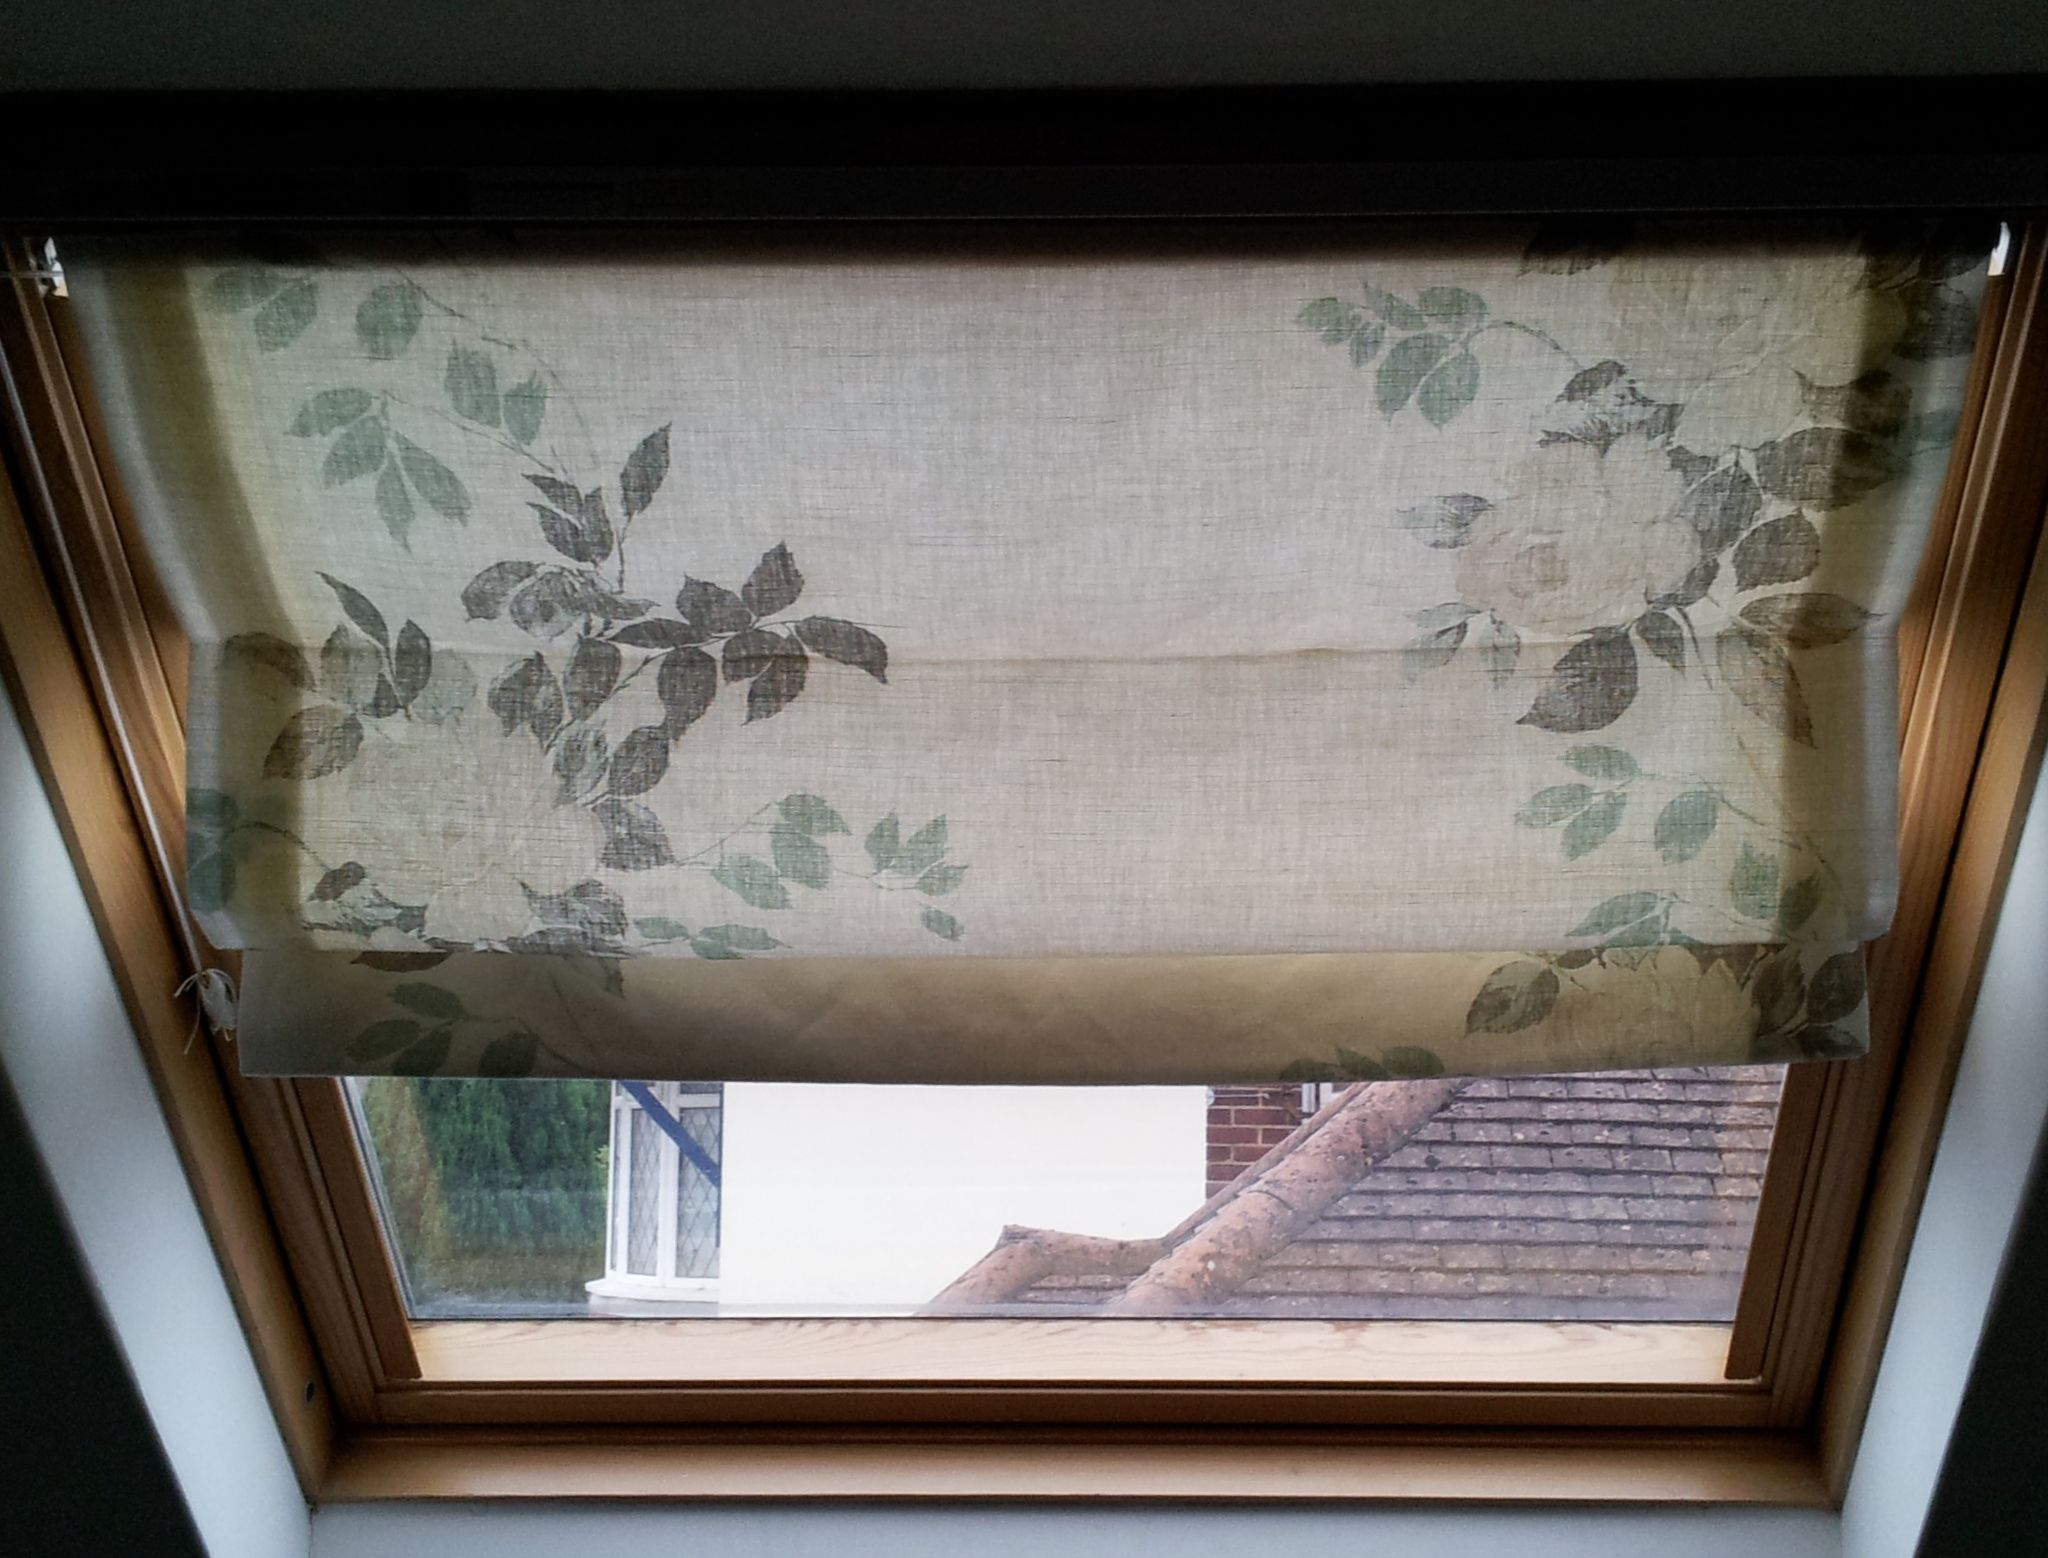 day for blinds blackout velux next skylight skye blind vale window